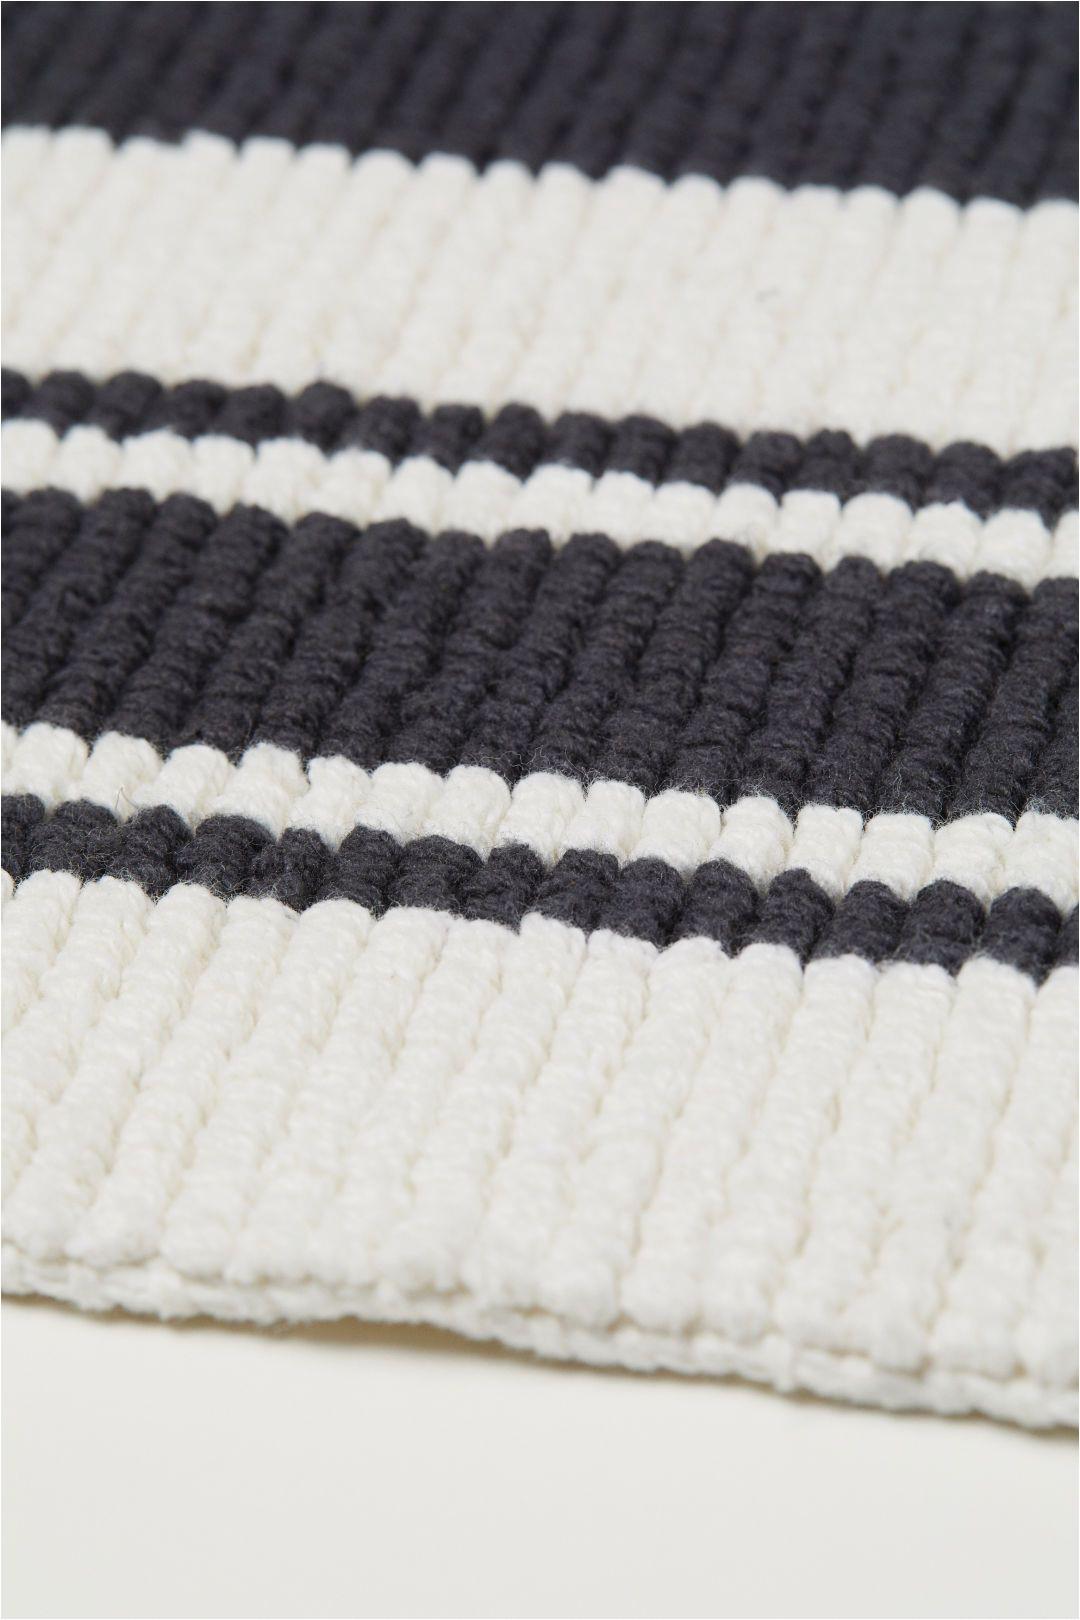 Black and White Bathroom Rug Runner Striped Bath Mat White Black Striped Home All